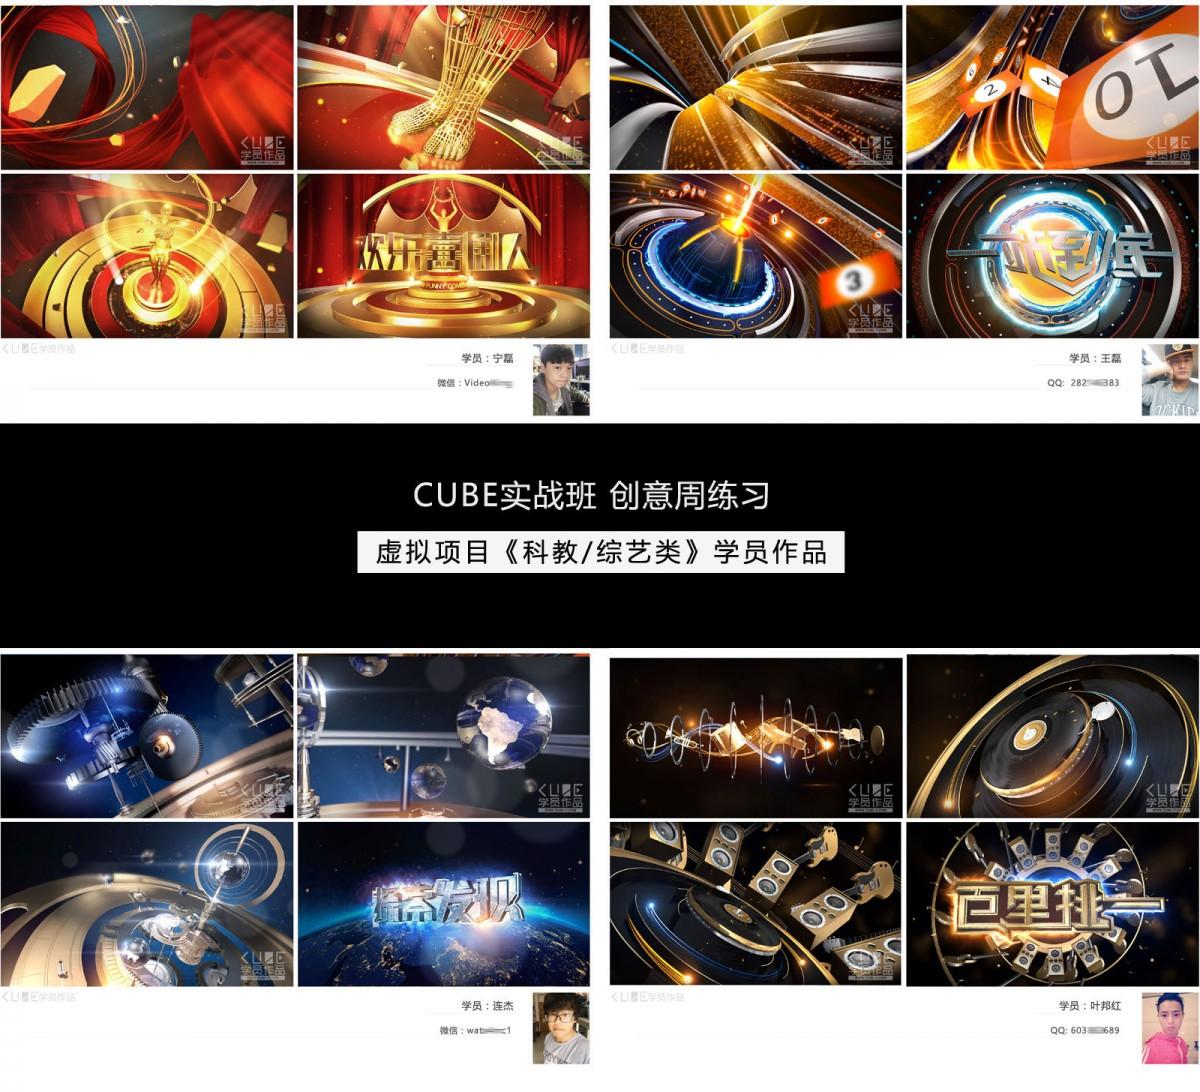 CUBE实战班 创意周——《文化/综艺/体育类》 虚拟项目练习